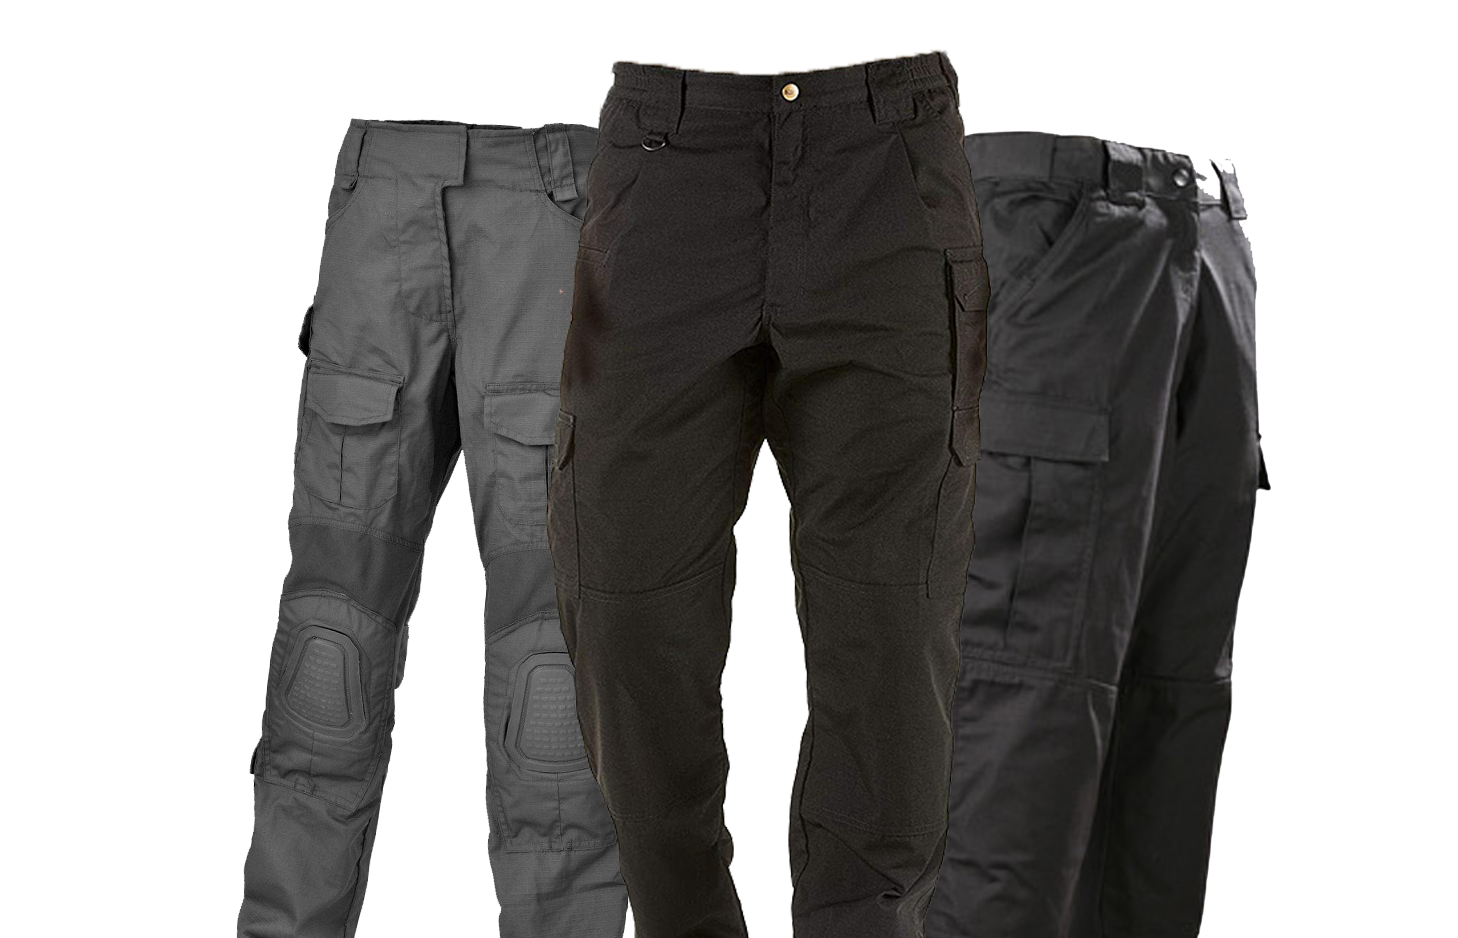 police tactical pants at bereli